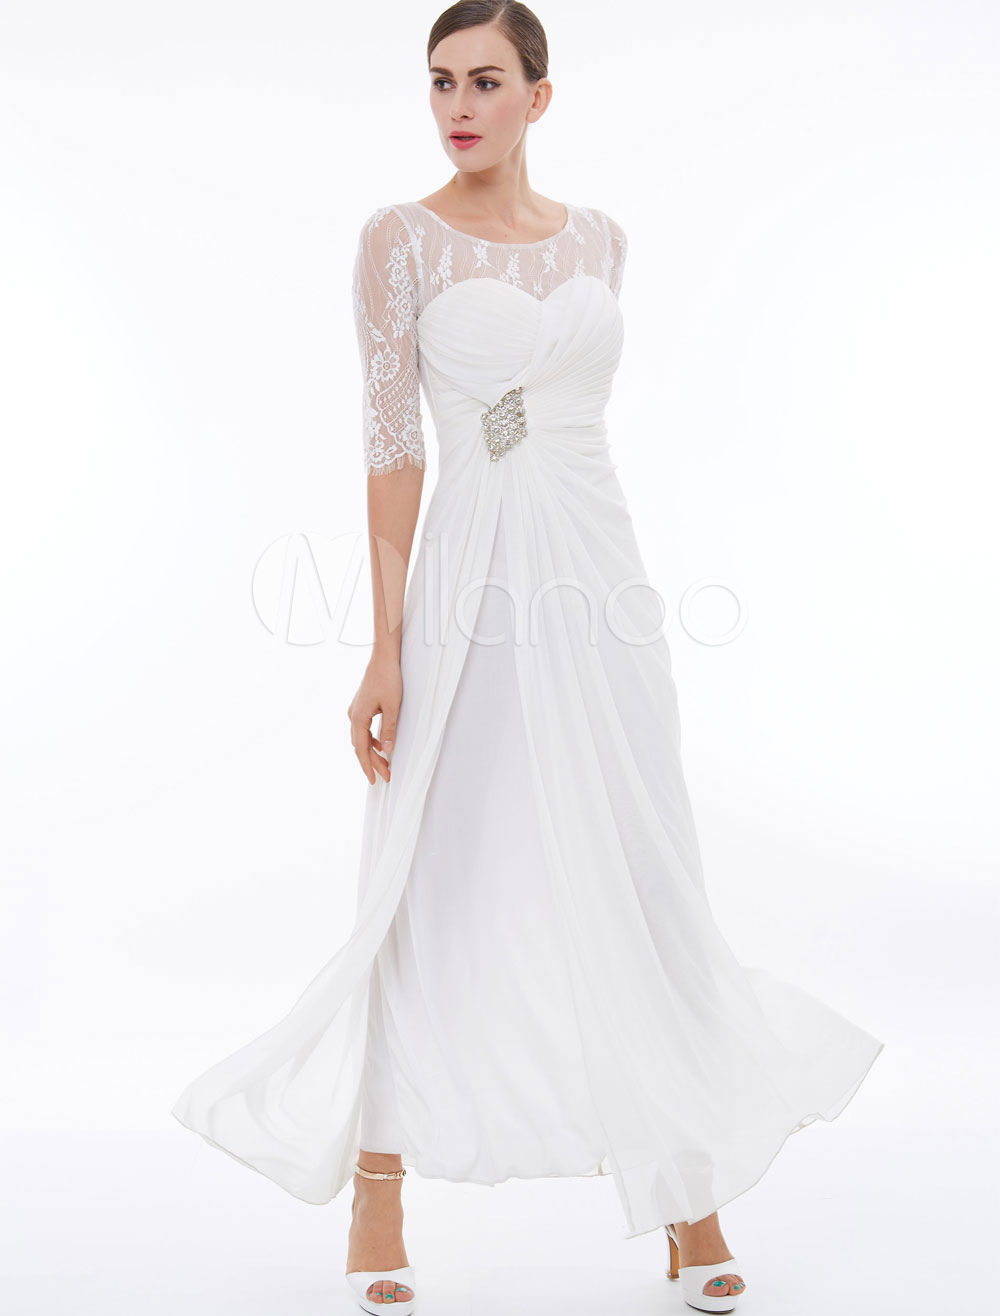 Wedding Guest Dresses White Chiffon Mother Of The Bride Dress Half Sleeve Rhinestones Beaded Side Draped Wedding Party Dress